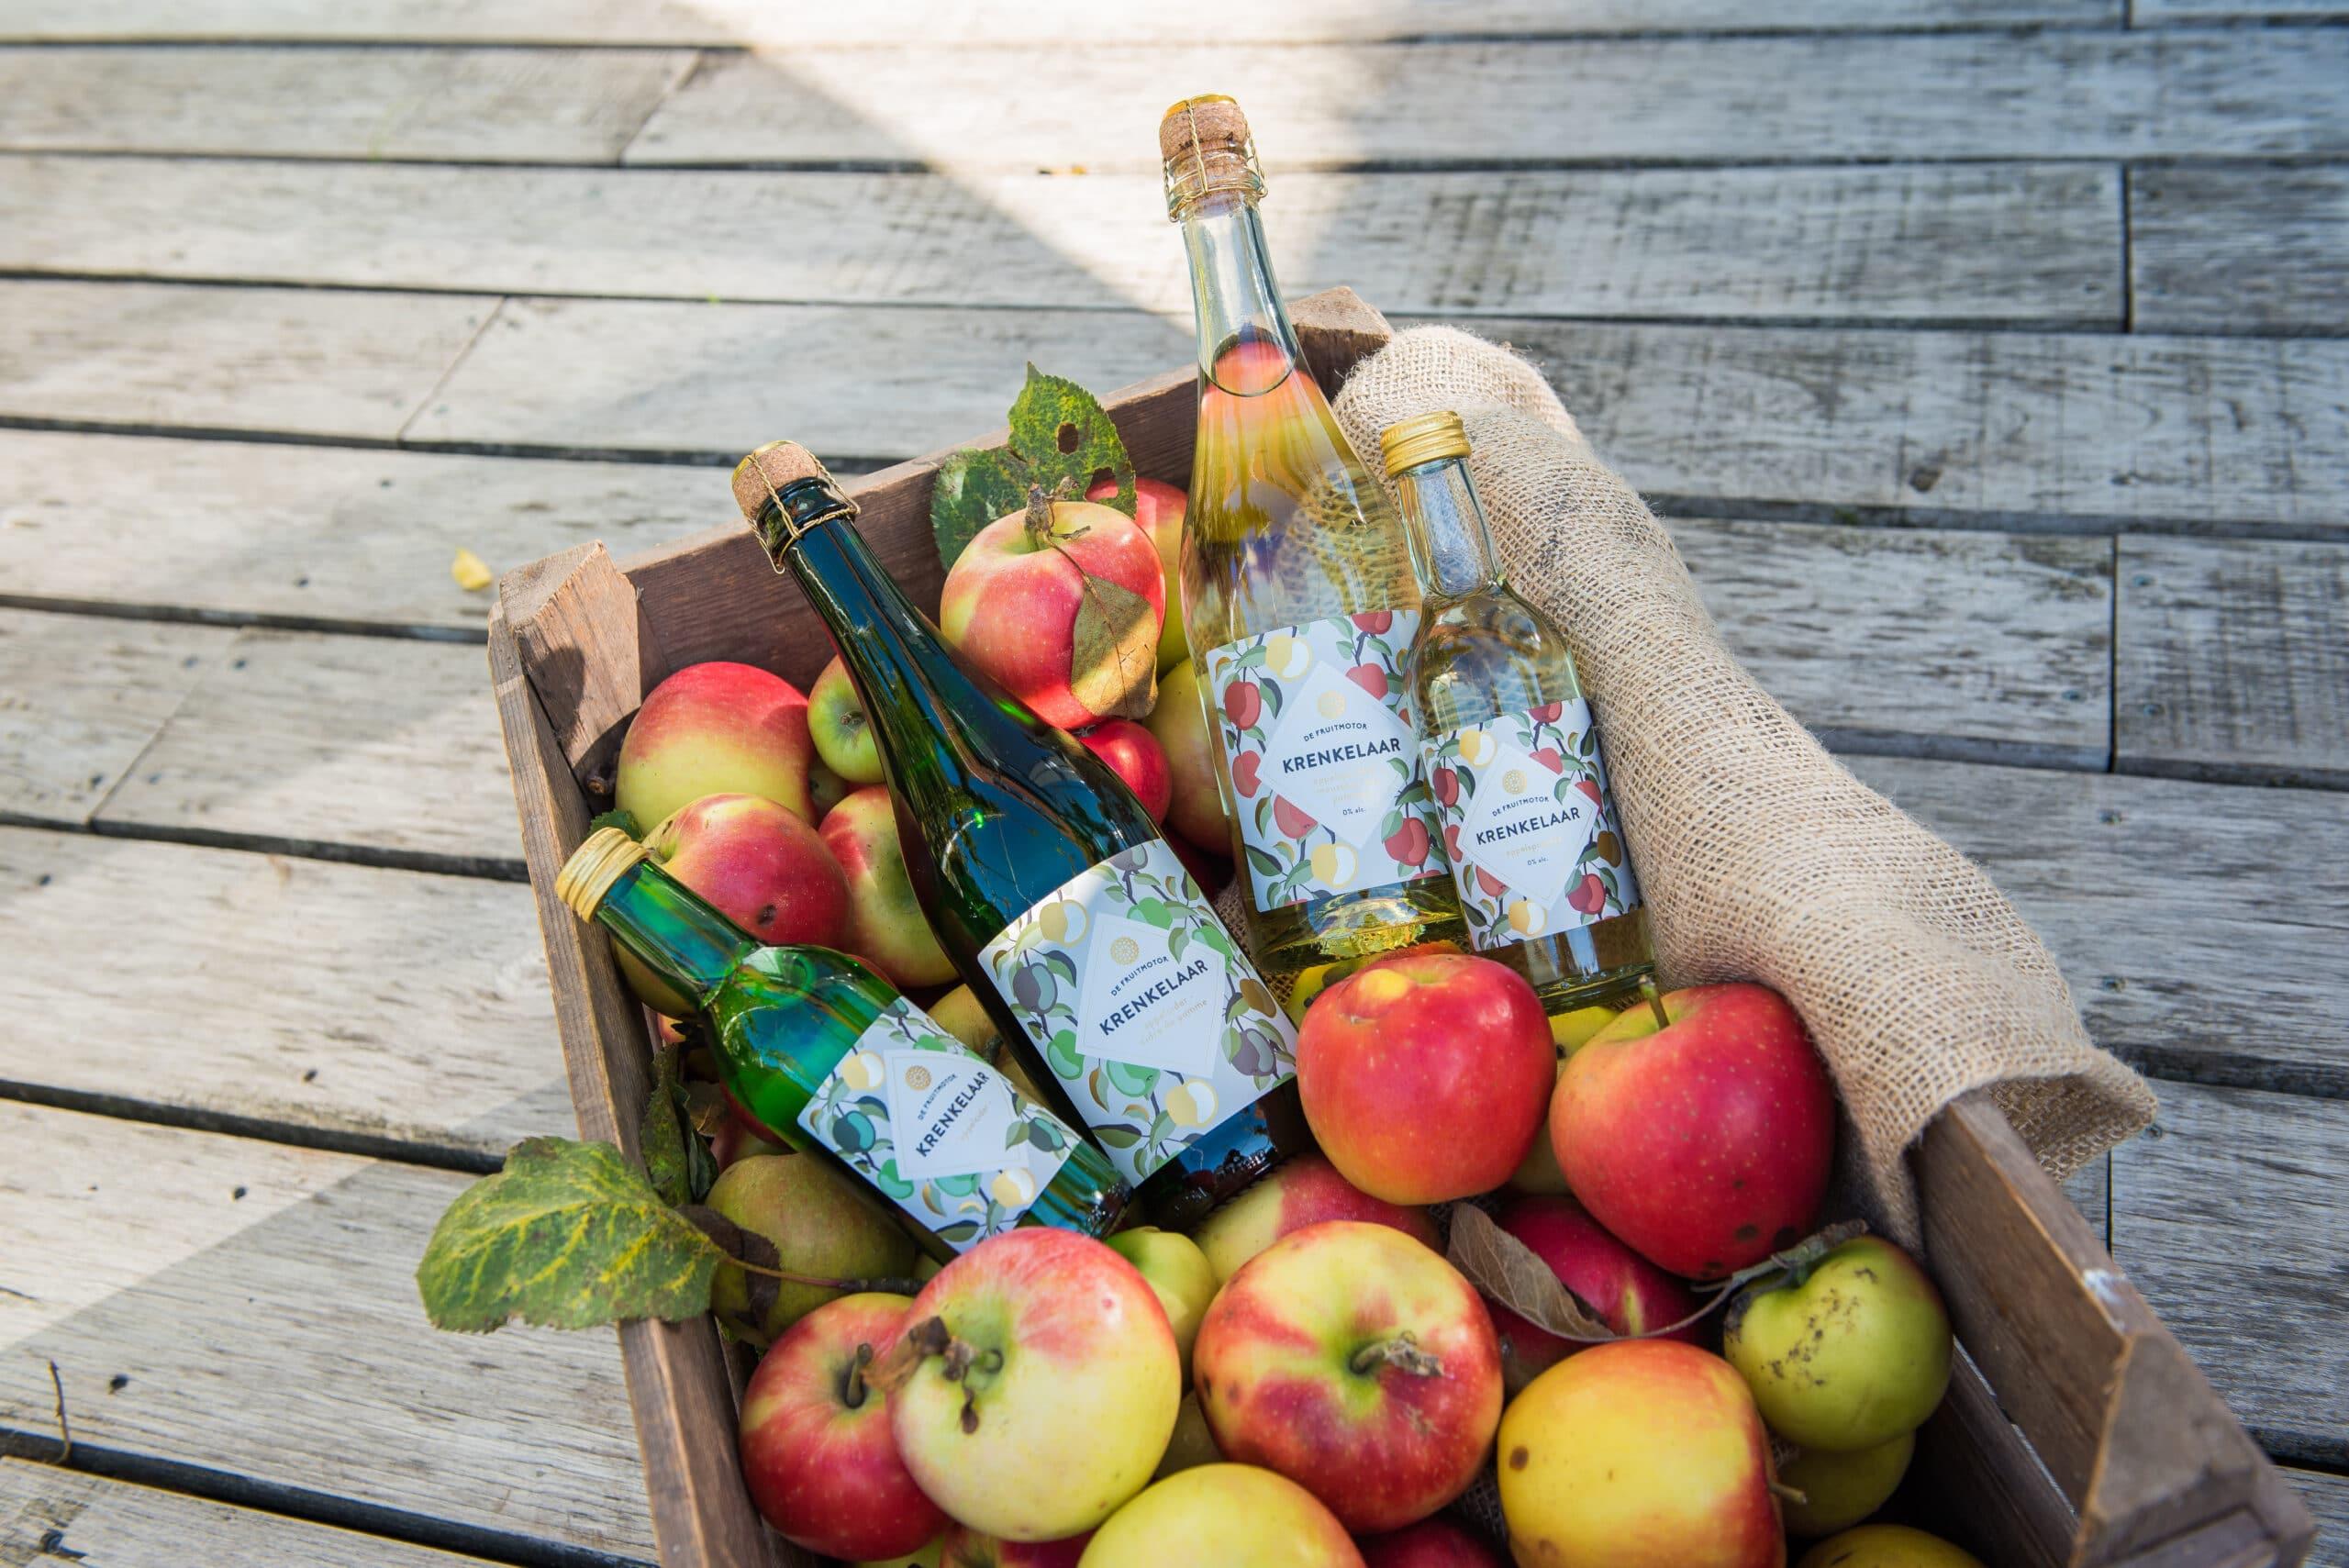 De lekkerste cider van Nederland